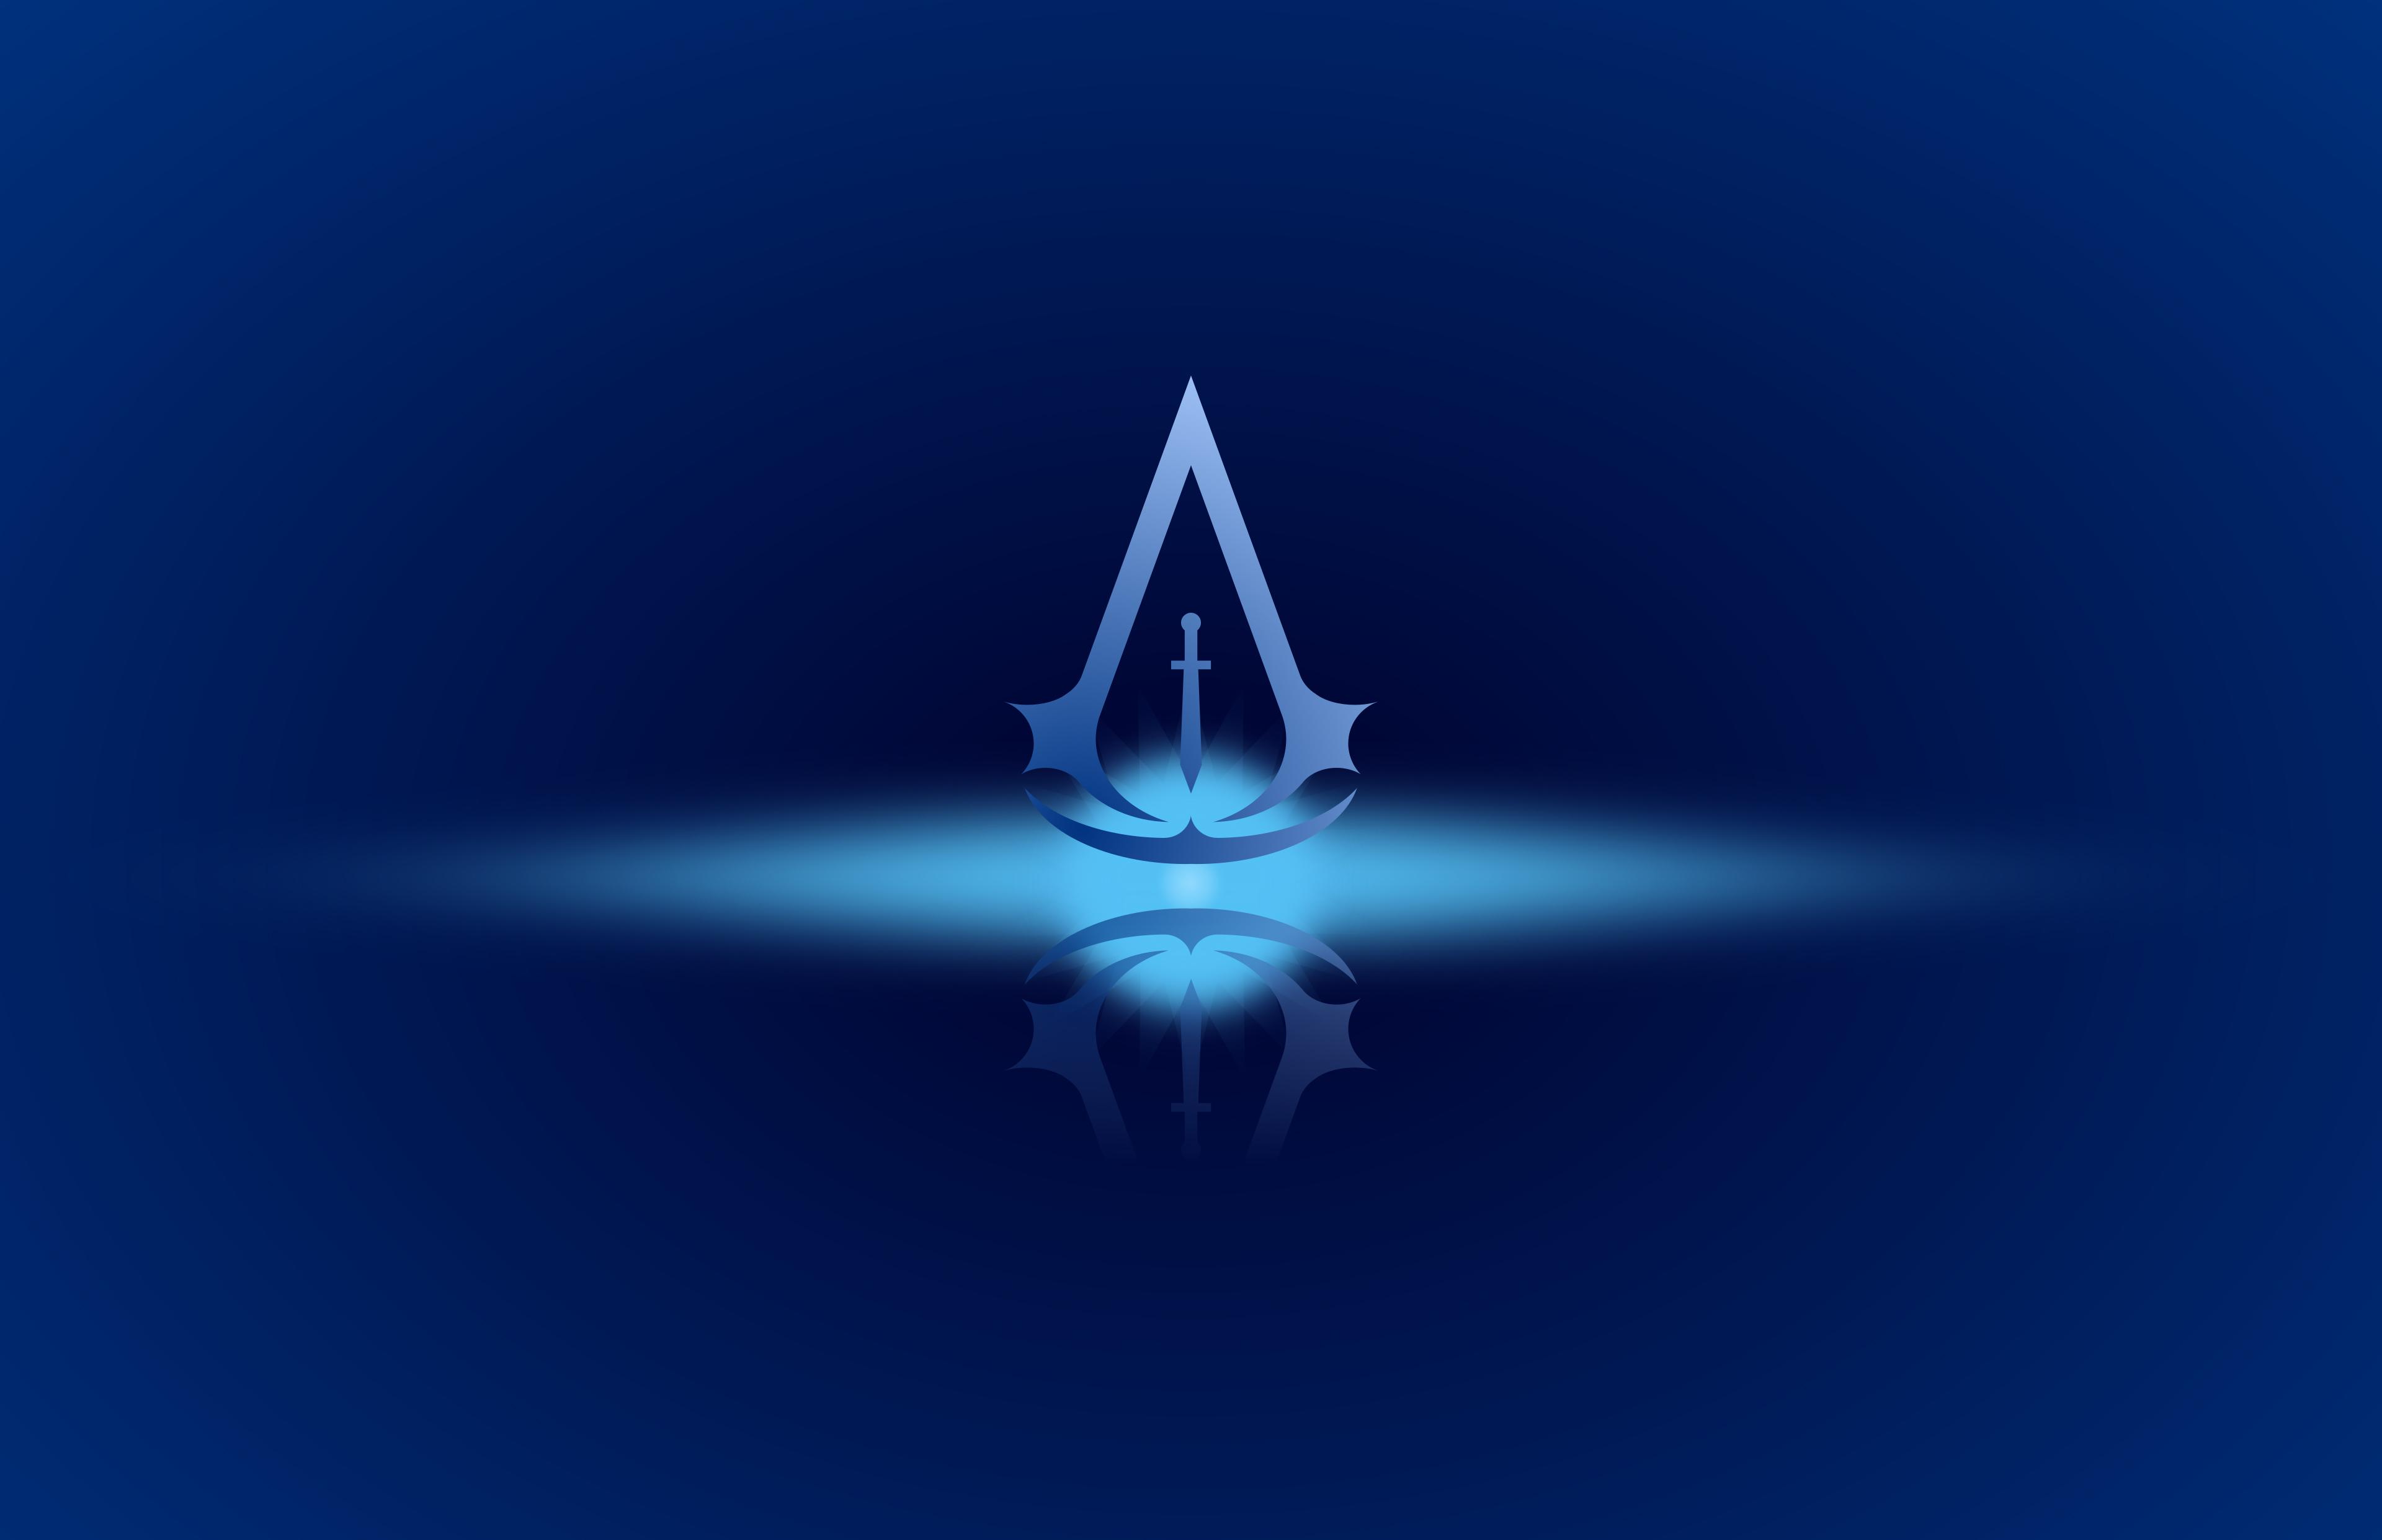 Assassins Creed 4k Minimal Logo Hd Games 4k Wallpapers Images